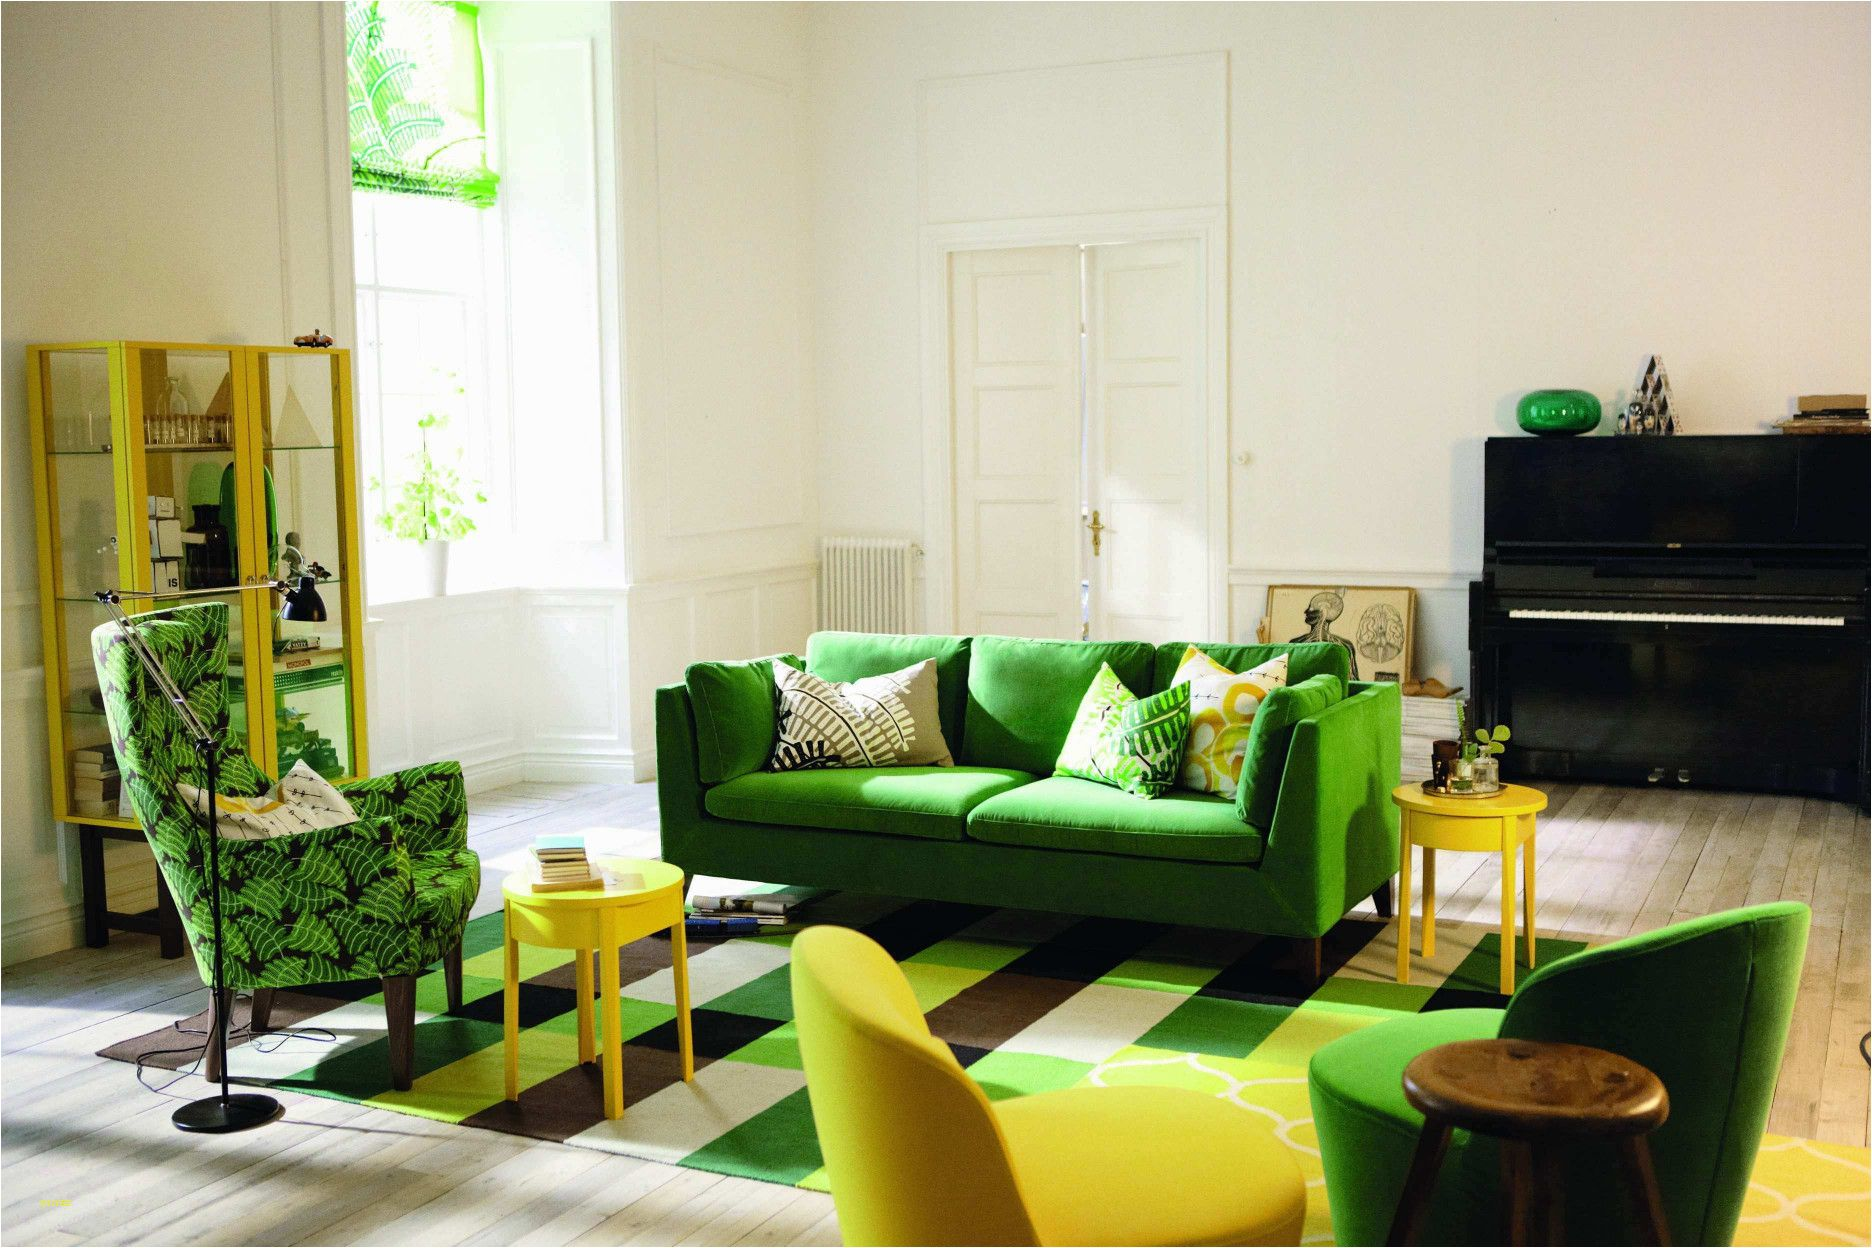 32 Impresionante Muebles De Jardin En Carrefour - muebles de jardin ...